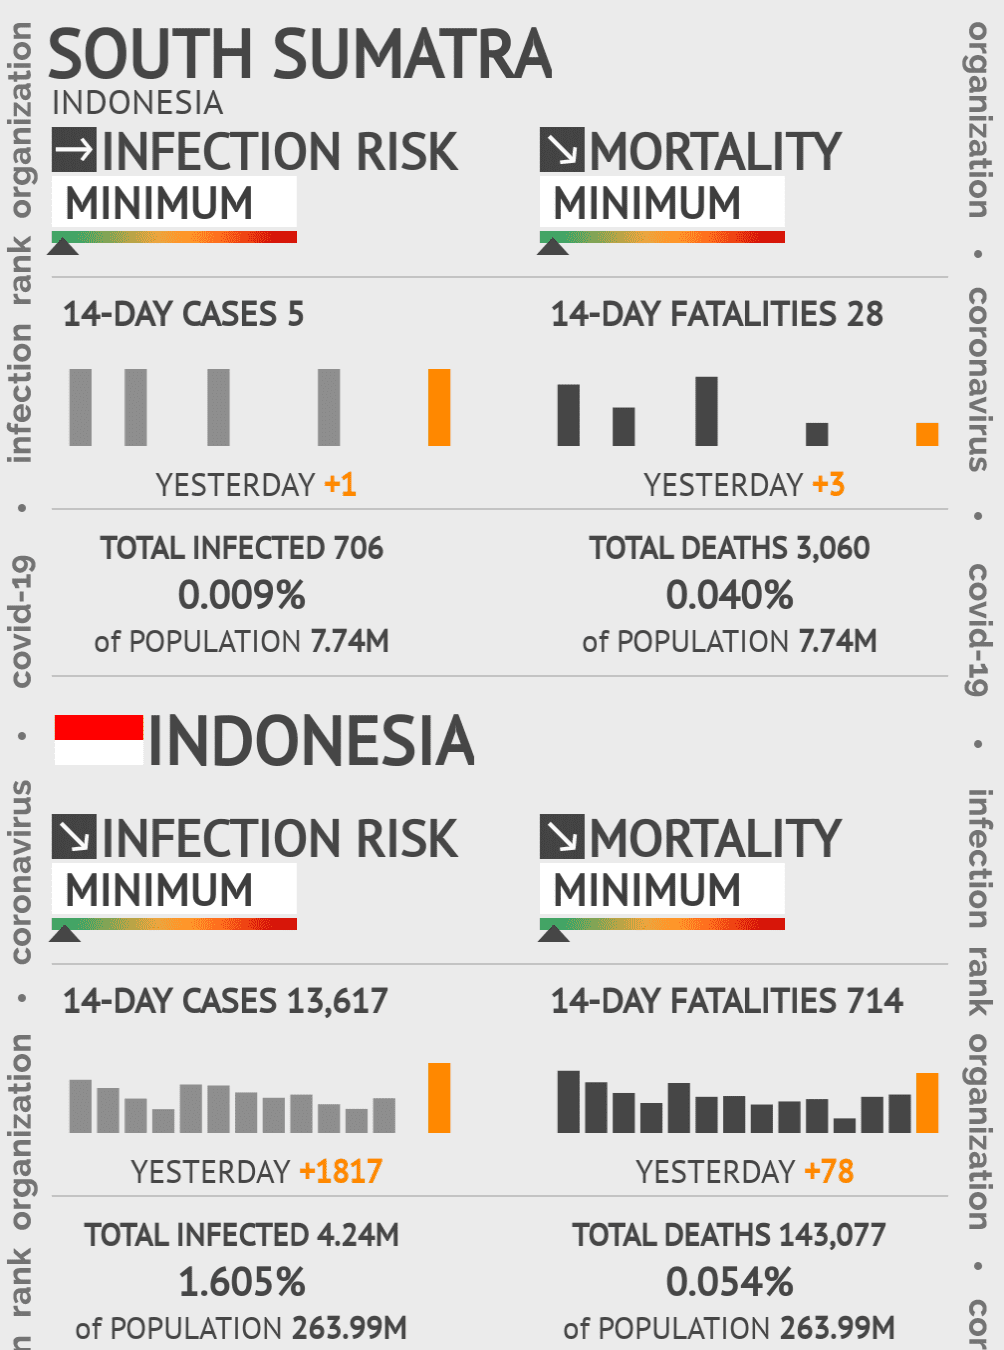 South Sumatra Coronavirus Covid-19 Risk of Infection on March 07, 2021